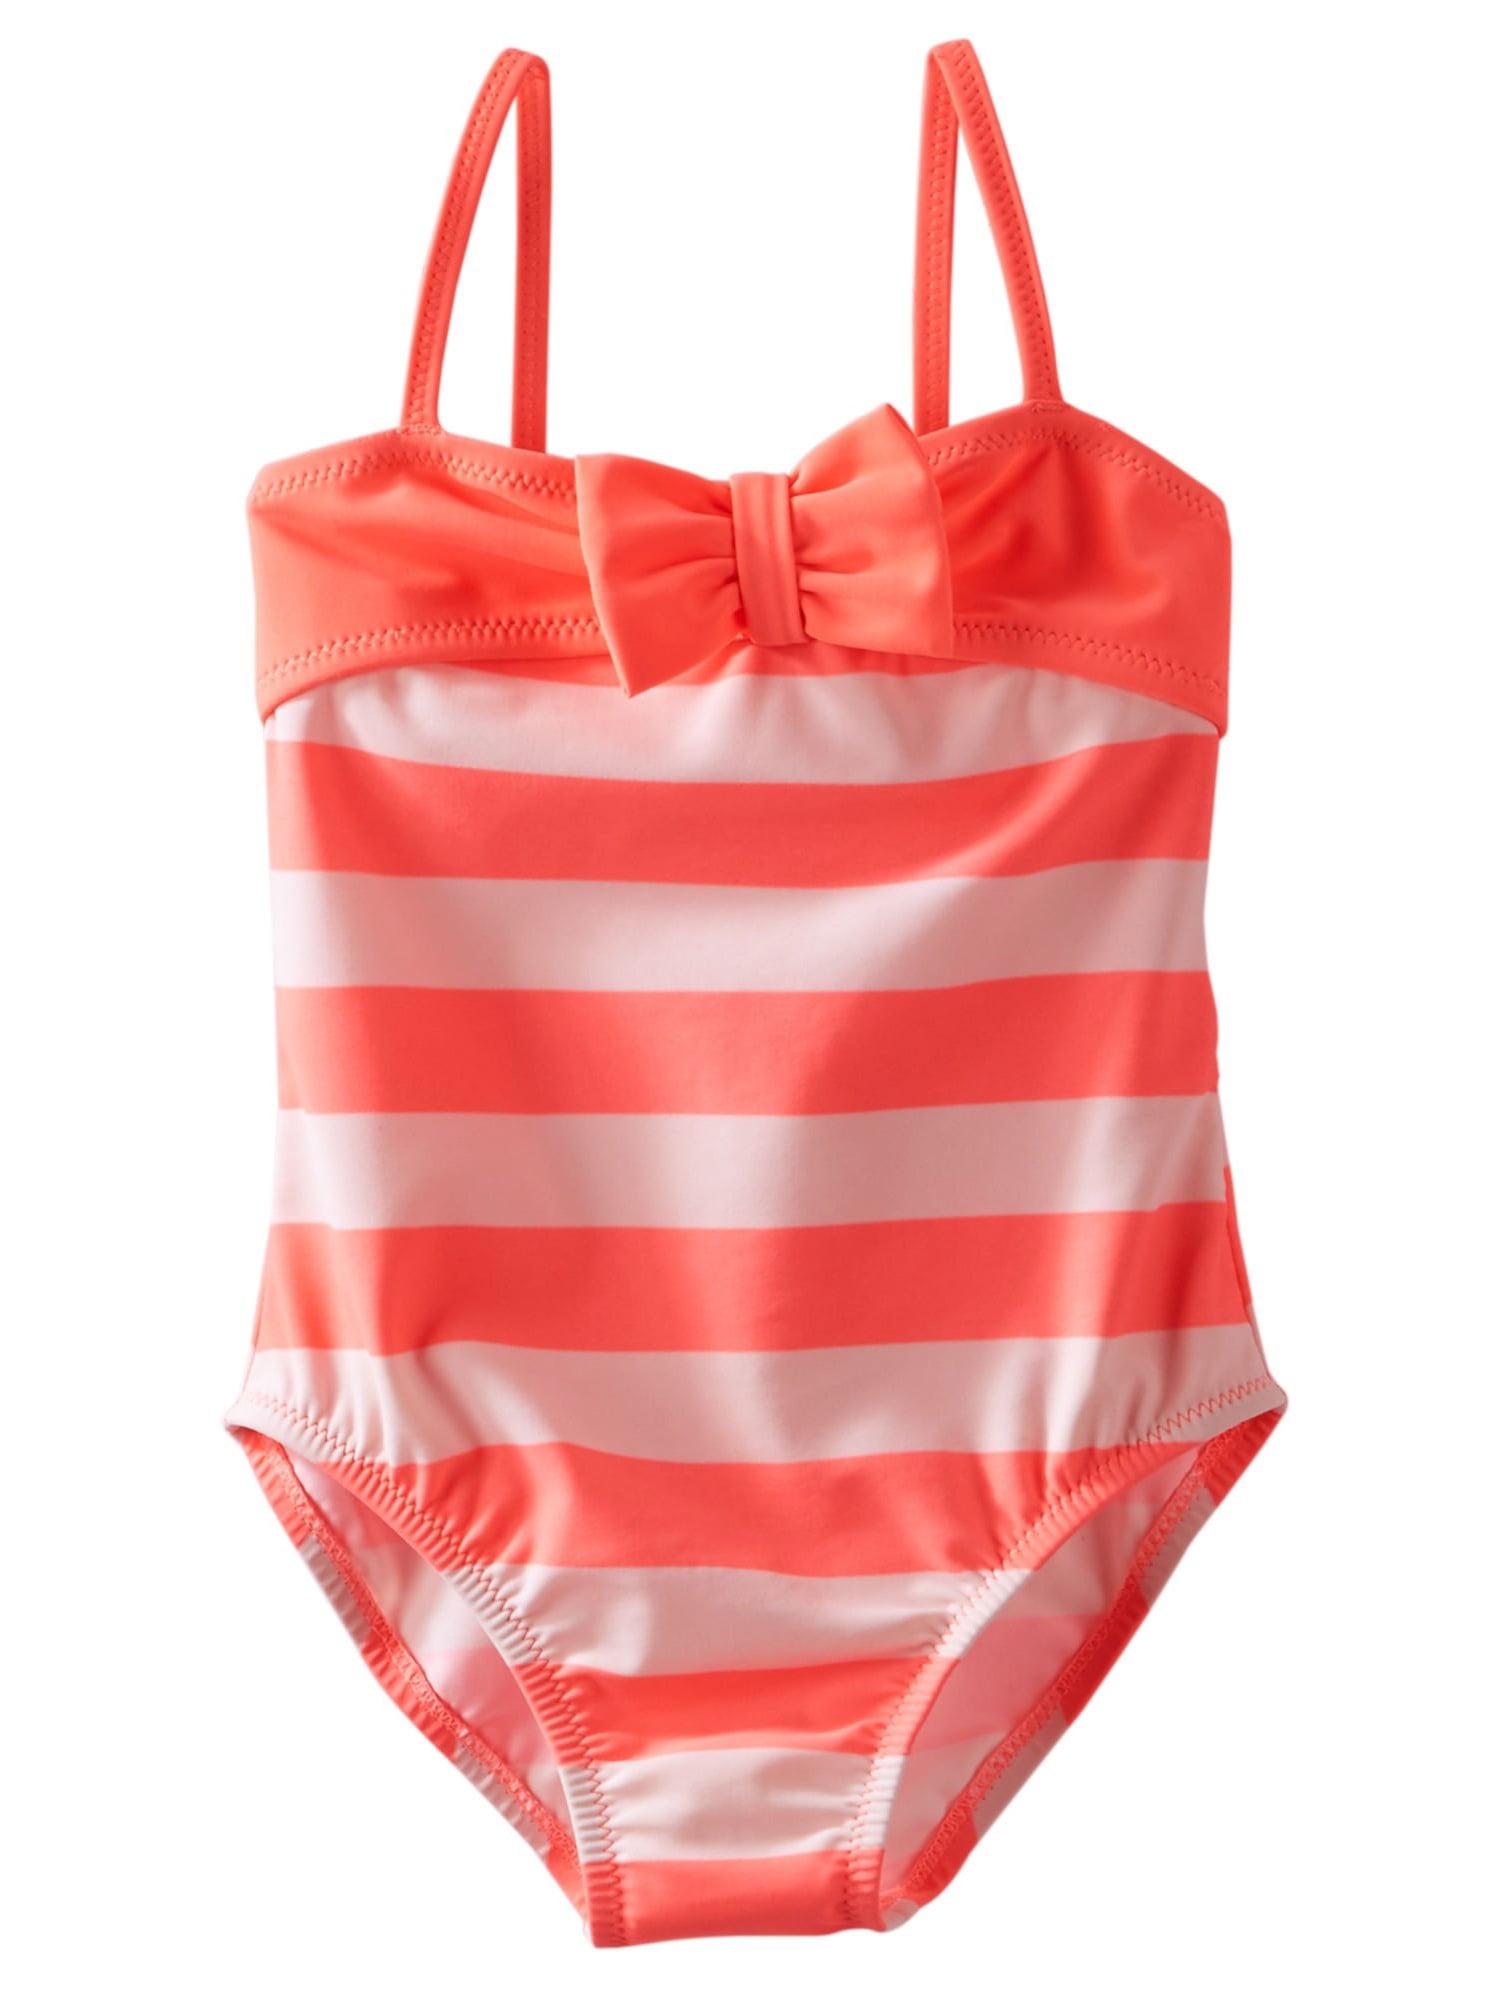 Oshkosh B'gosh Girls One Piece Swimsuit